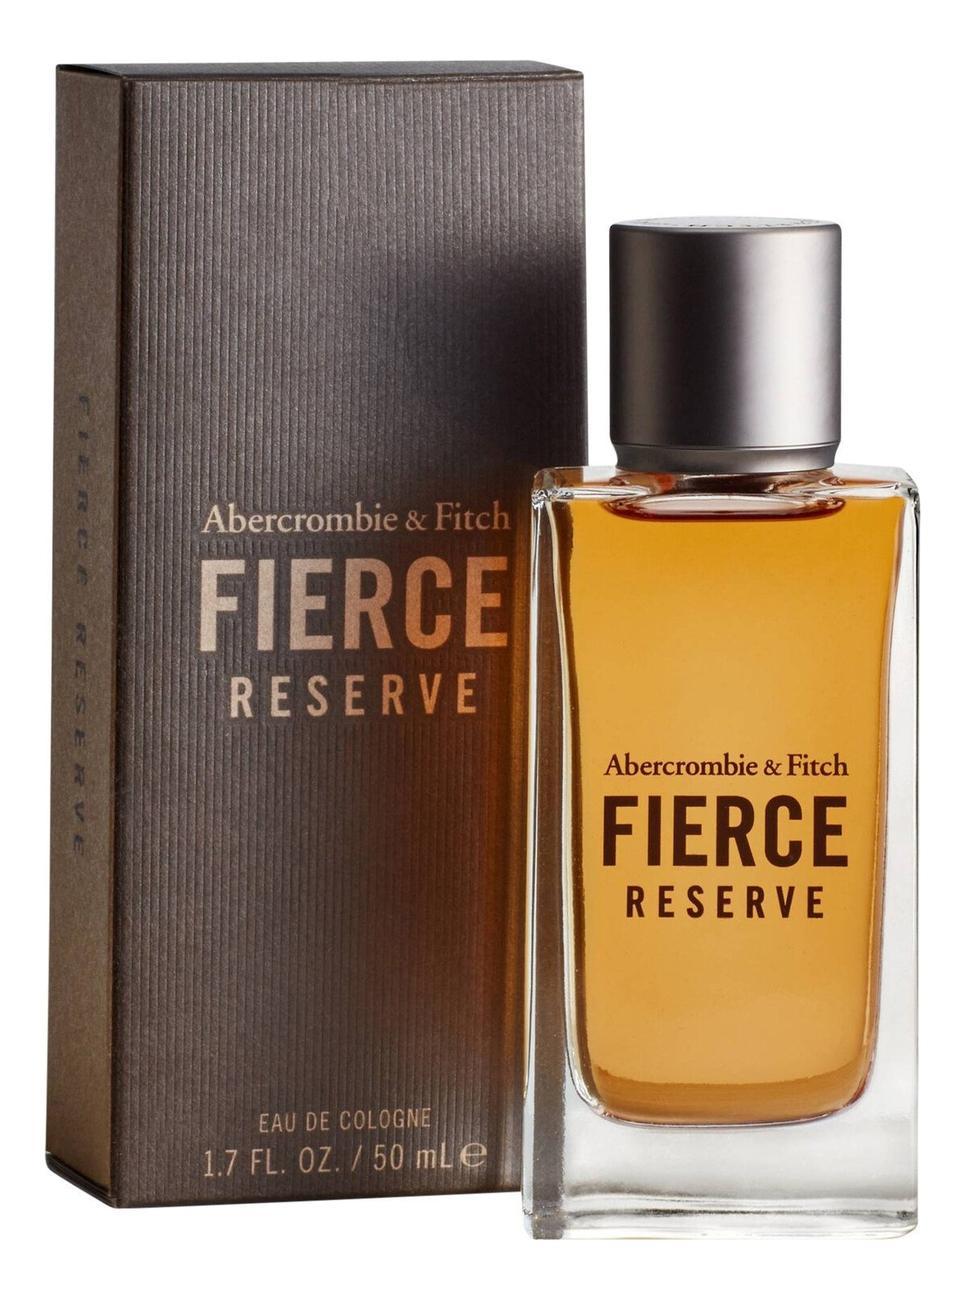 342246 2 abercrombie fitch fierce reserve